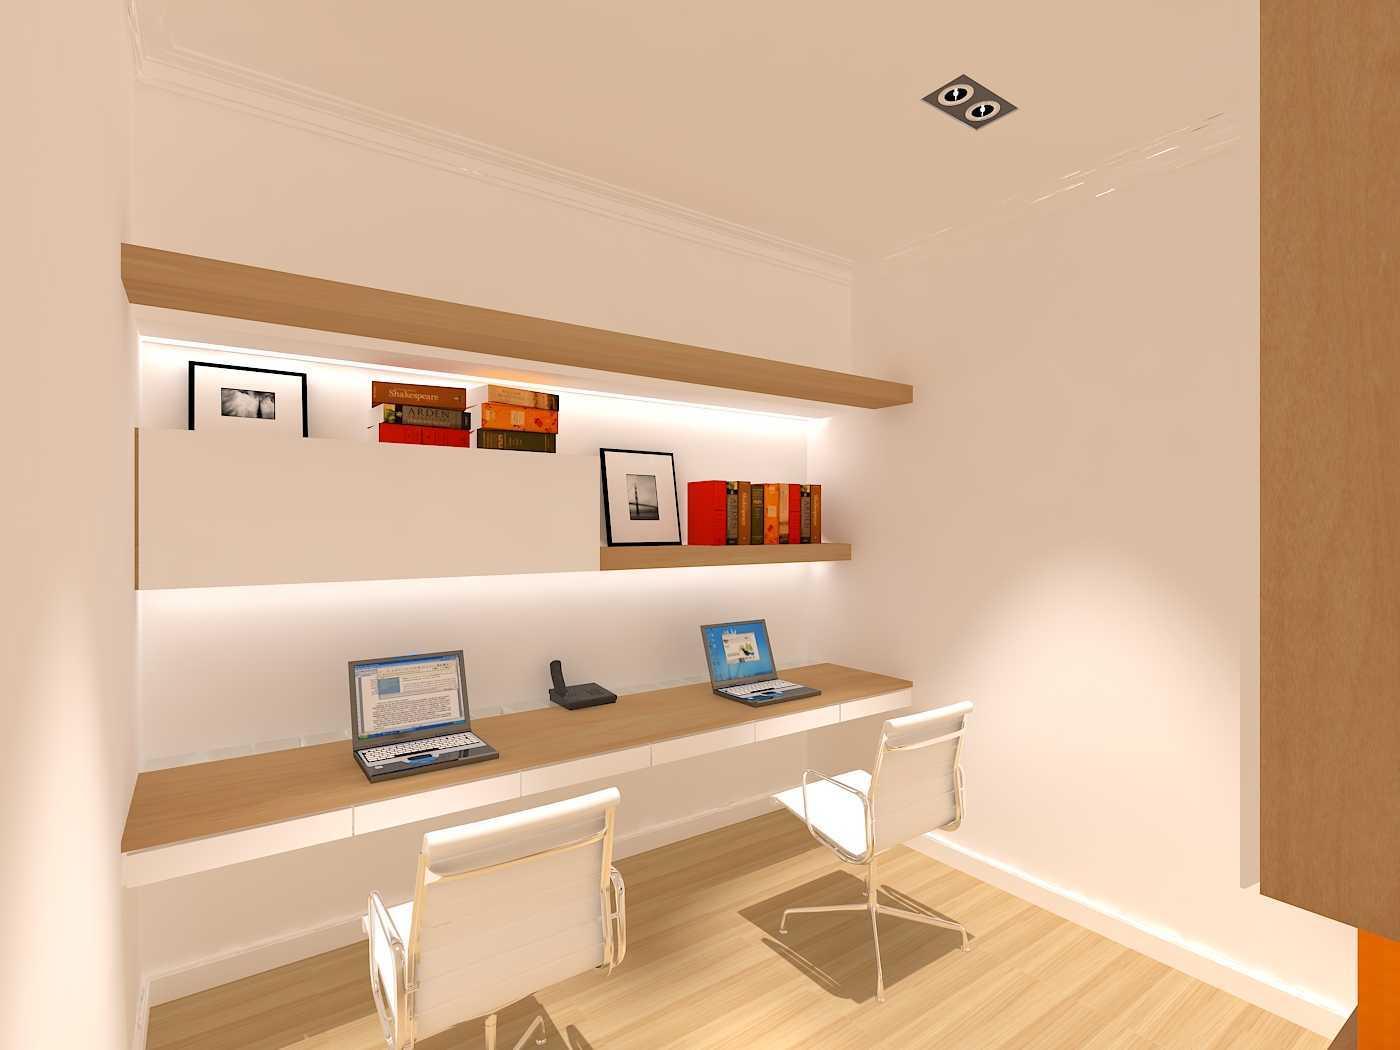 Emil Yusman (E'architect) Tebet Barat Jl. Tebet Barat Viii, Tebet Bar., Tebet, Kota Jakarta Selatan, Daerah Khusus Ibukota Jakarta 12810, Indonesia South Jakarta Study-Room  20198